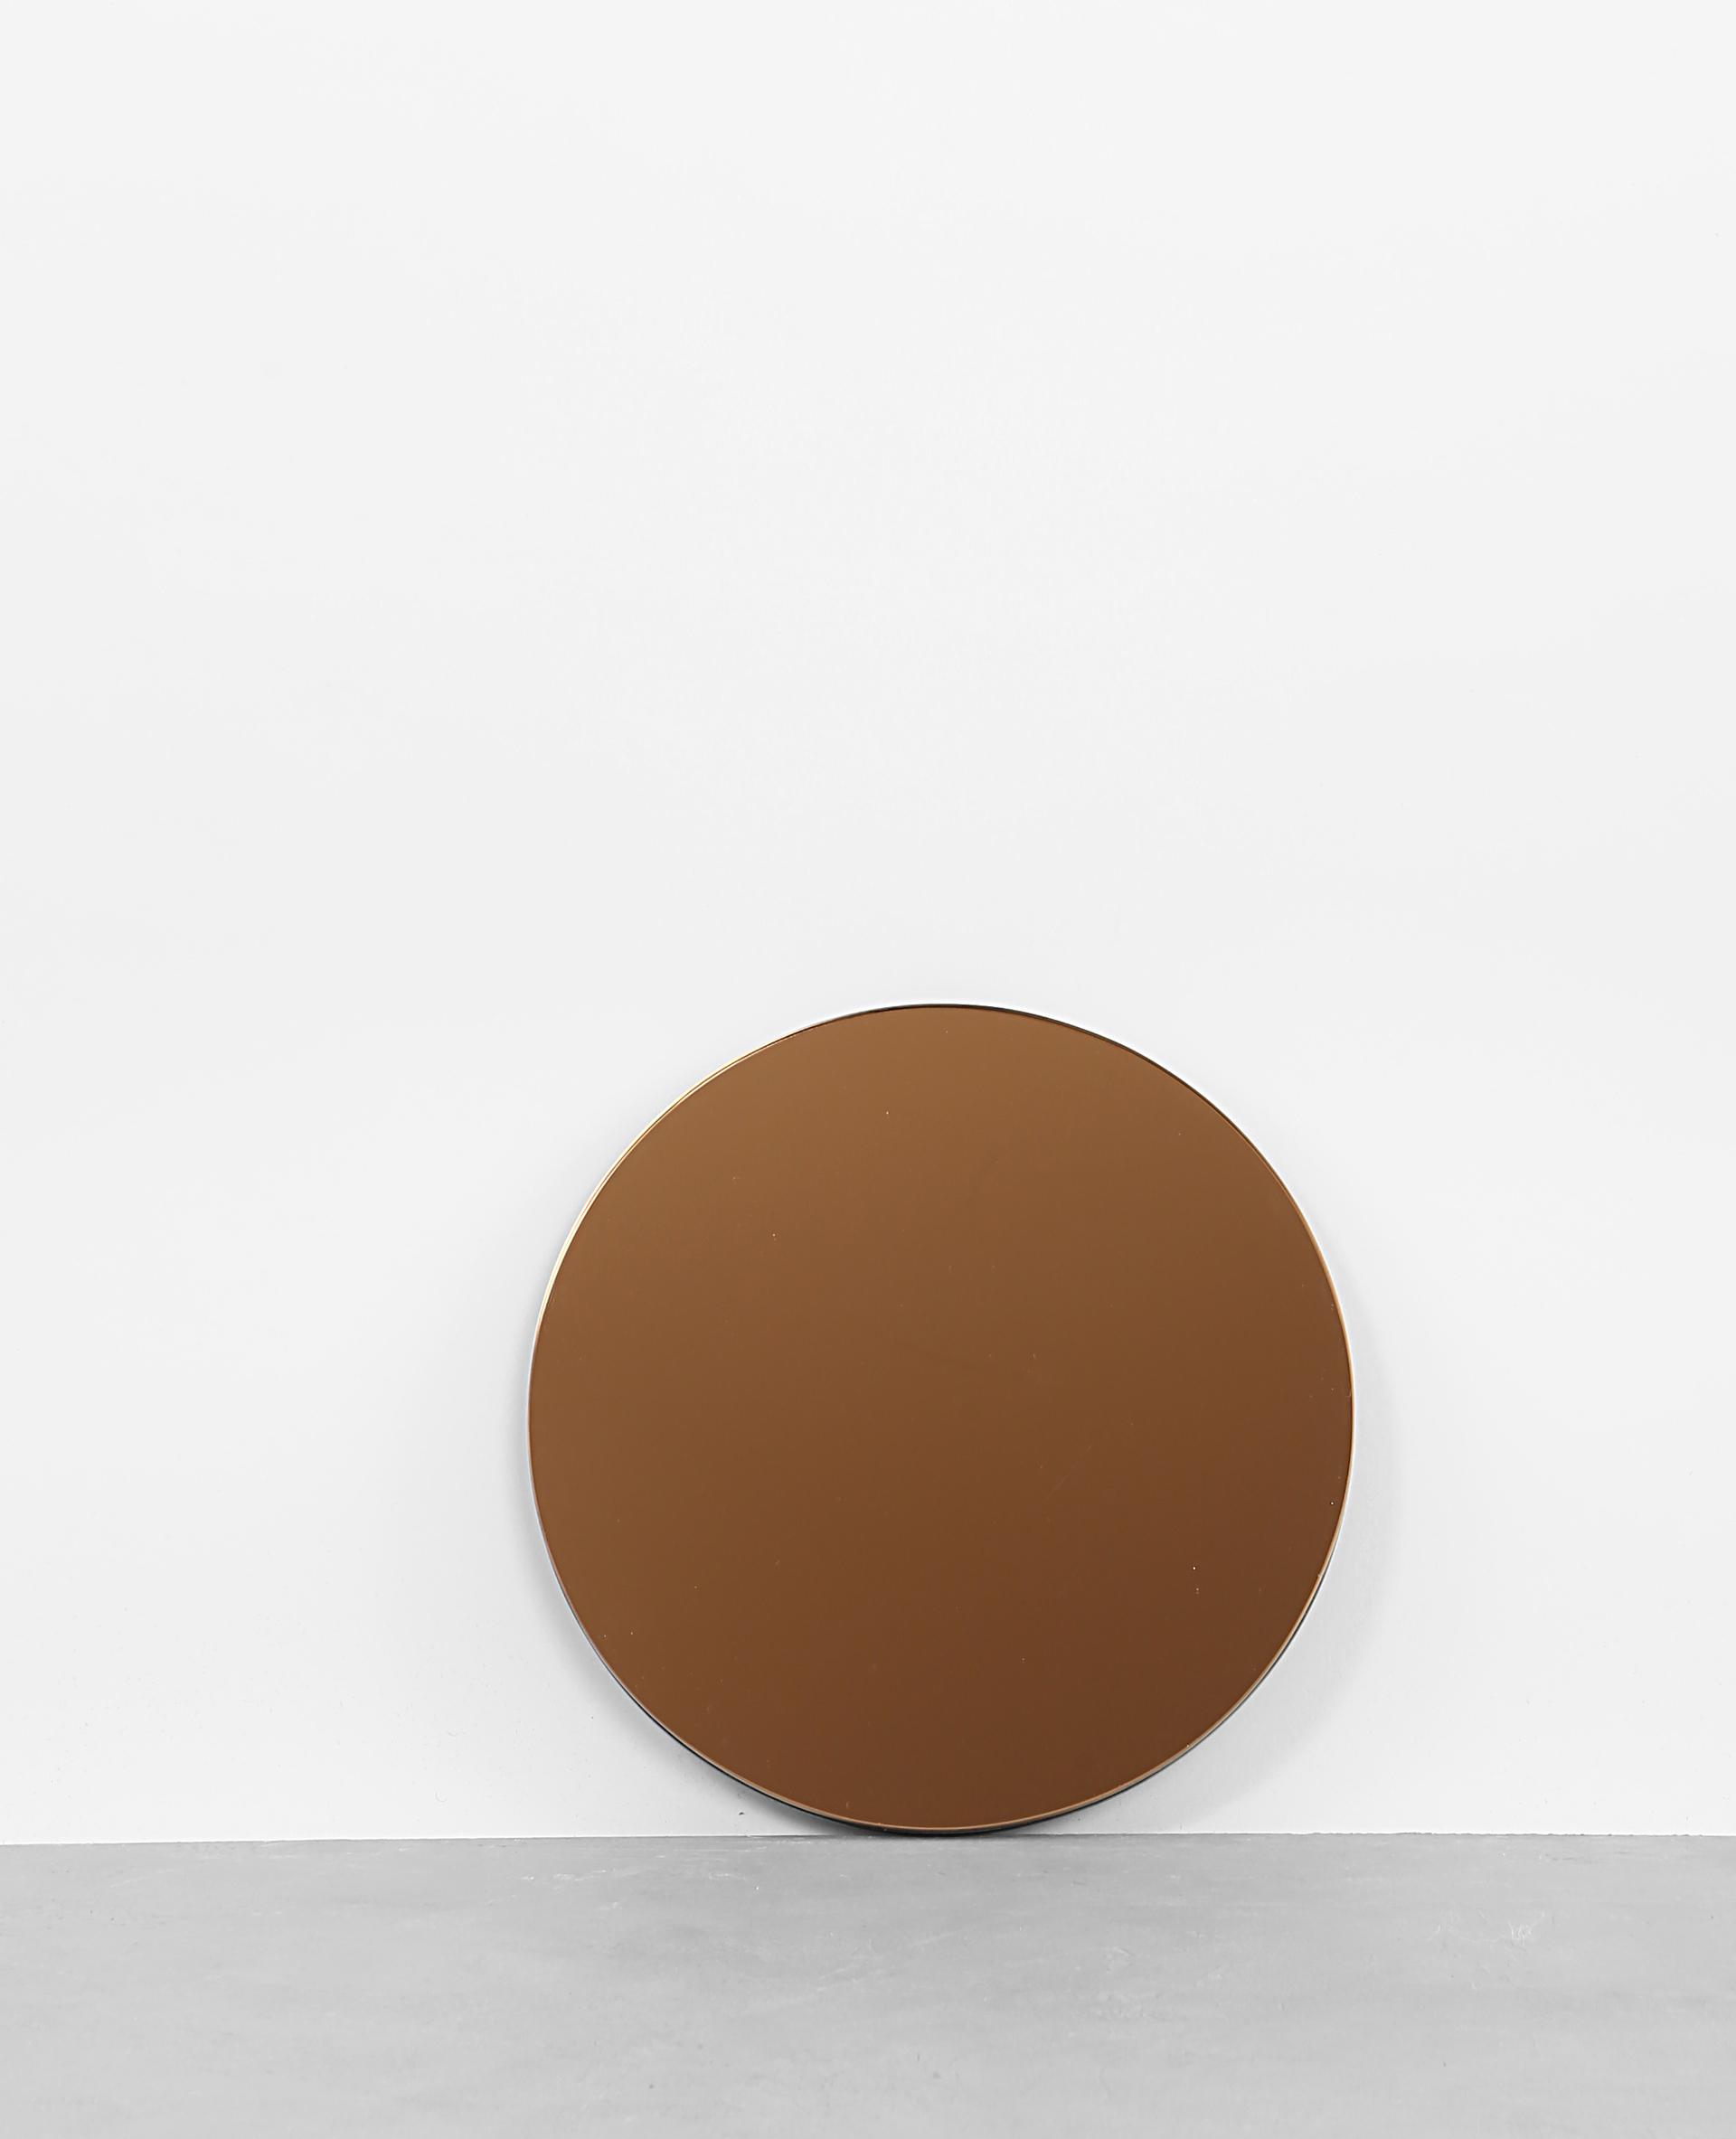 miroir rond copper cuivr 902311g04a0g pimkie. Black Bedroom Furniture Sets. Home Design Ideas